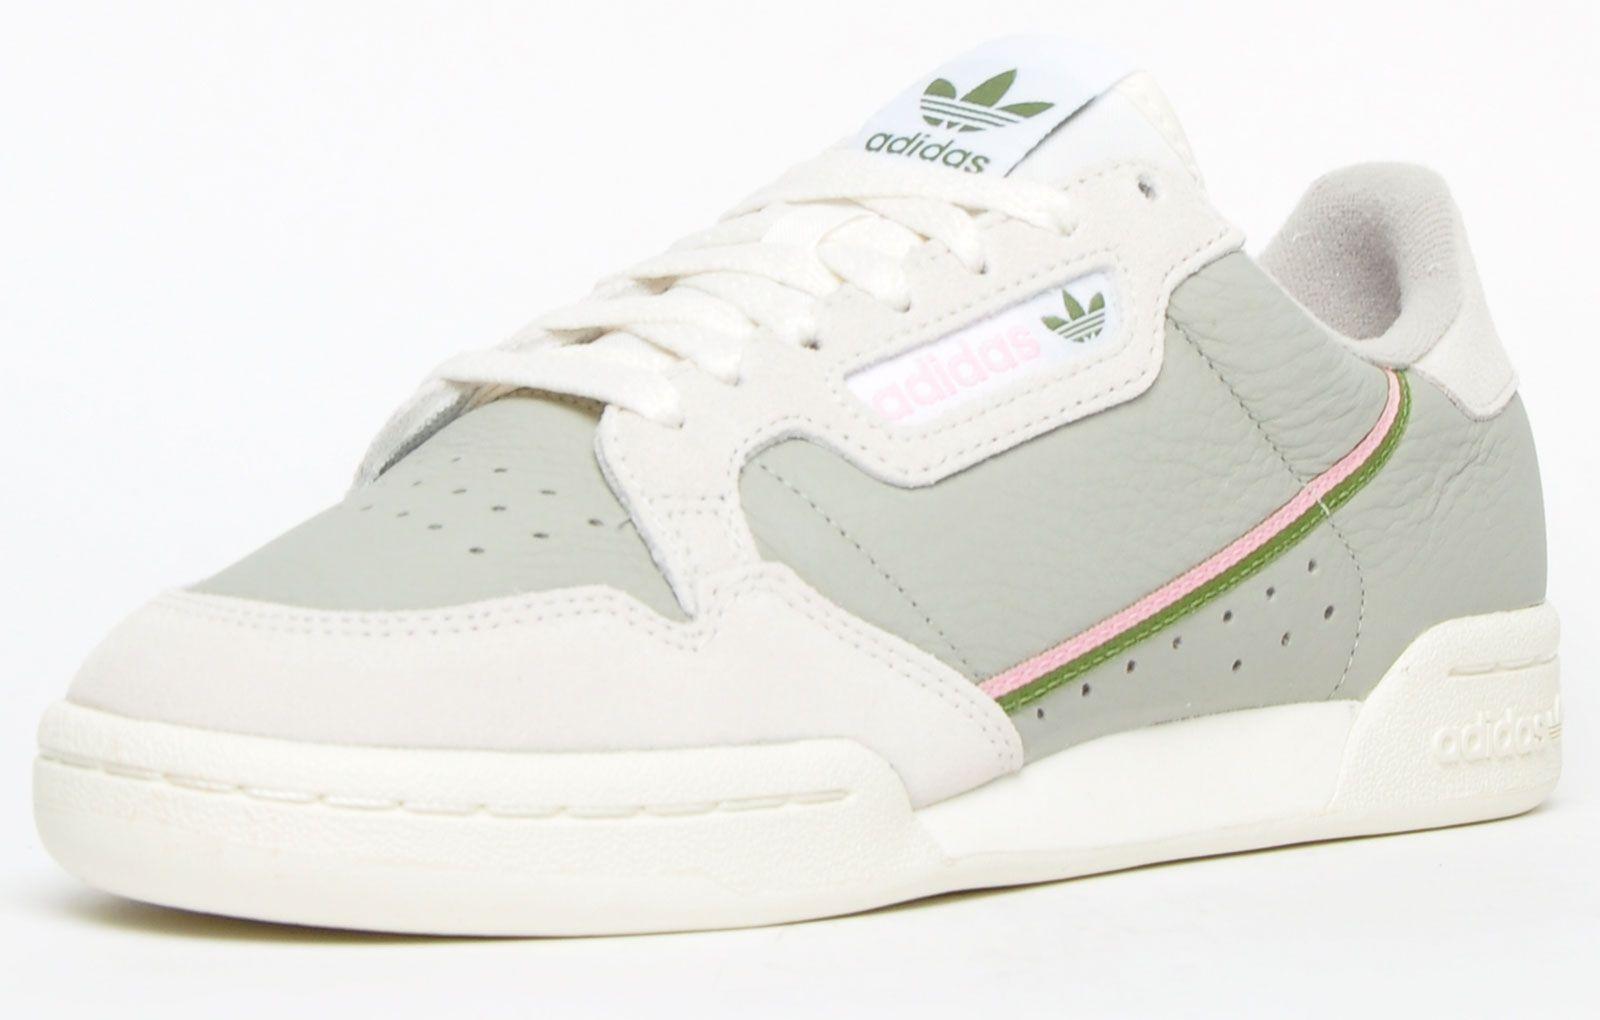 Adidas Originals Continental 80 Womens